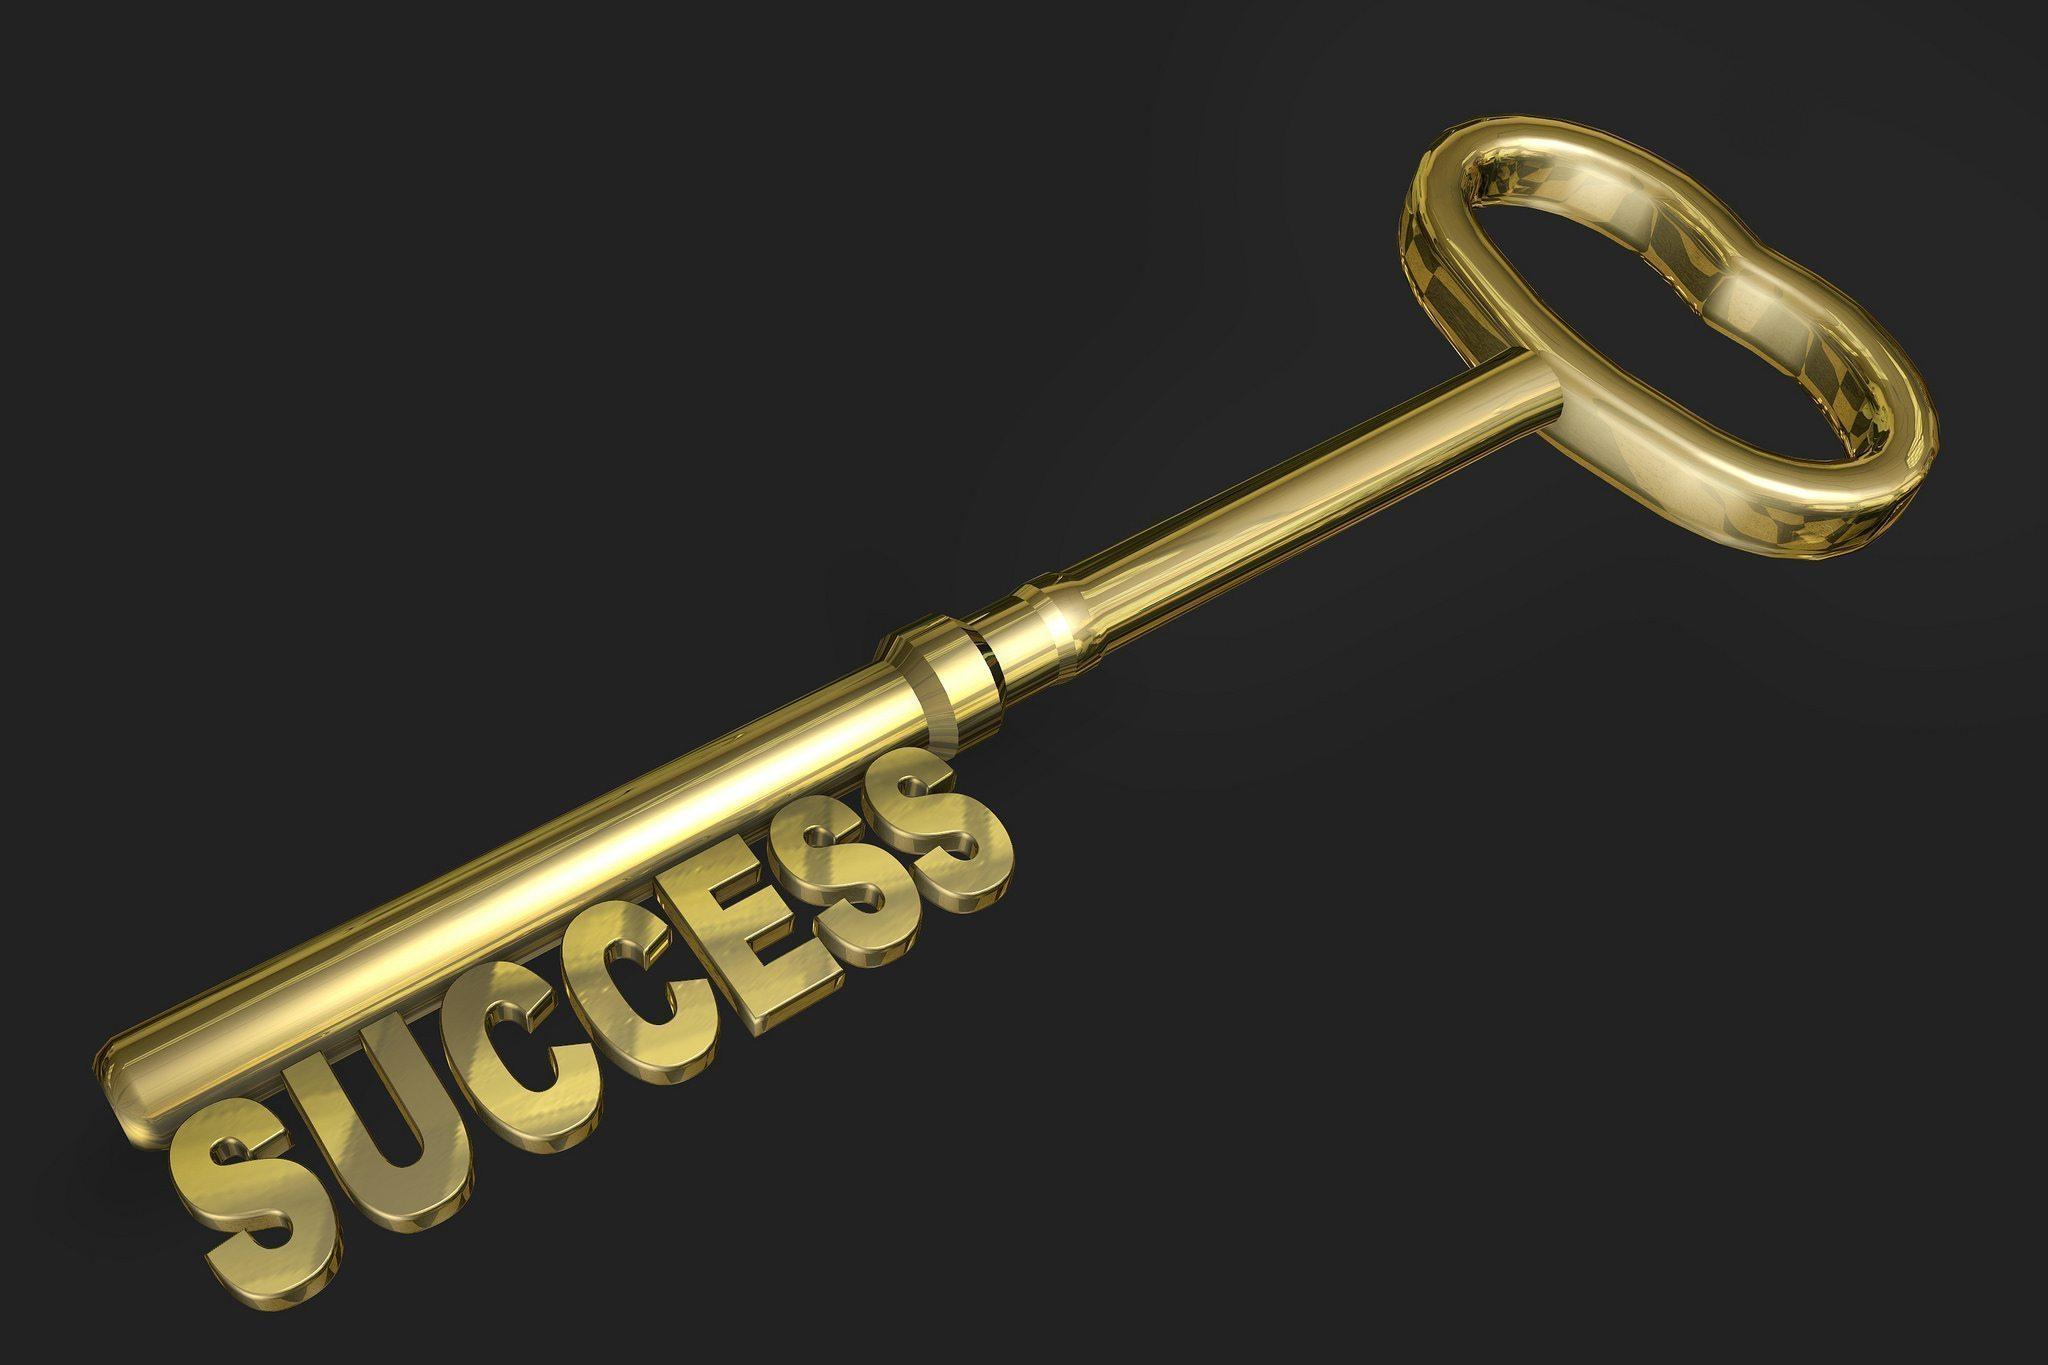 رموز موفقیت